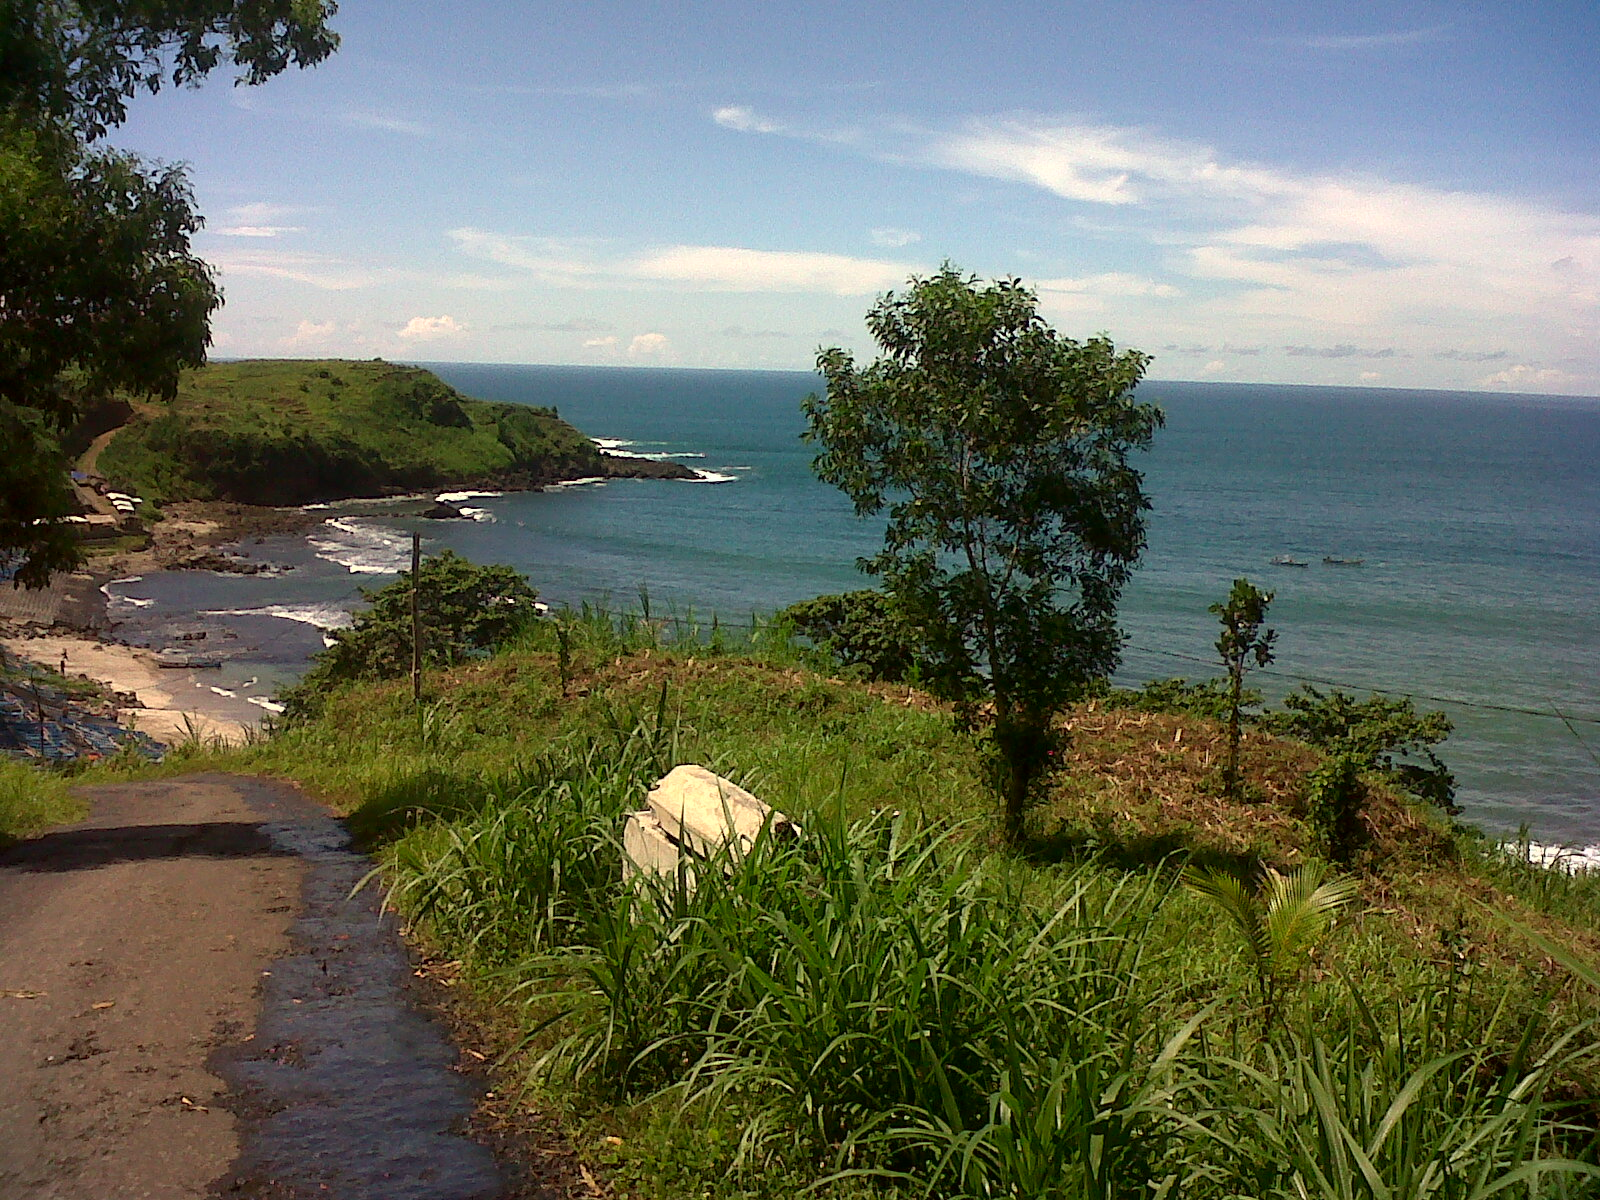 Pantai Menganti Kebumen 2018 Rute Peta Jalan Menuju Lokasi Harga